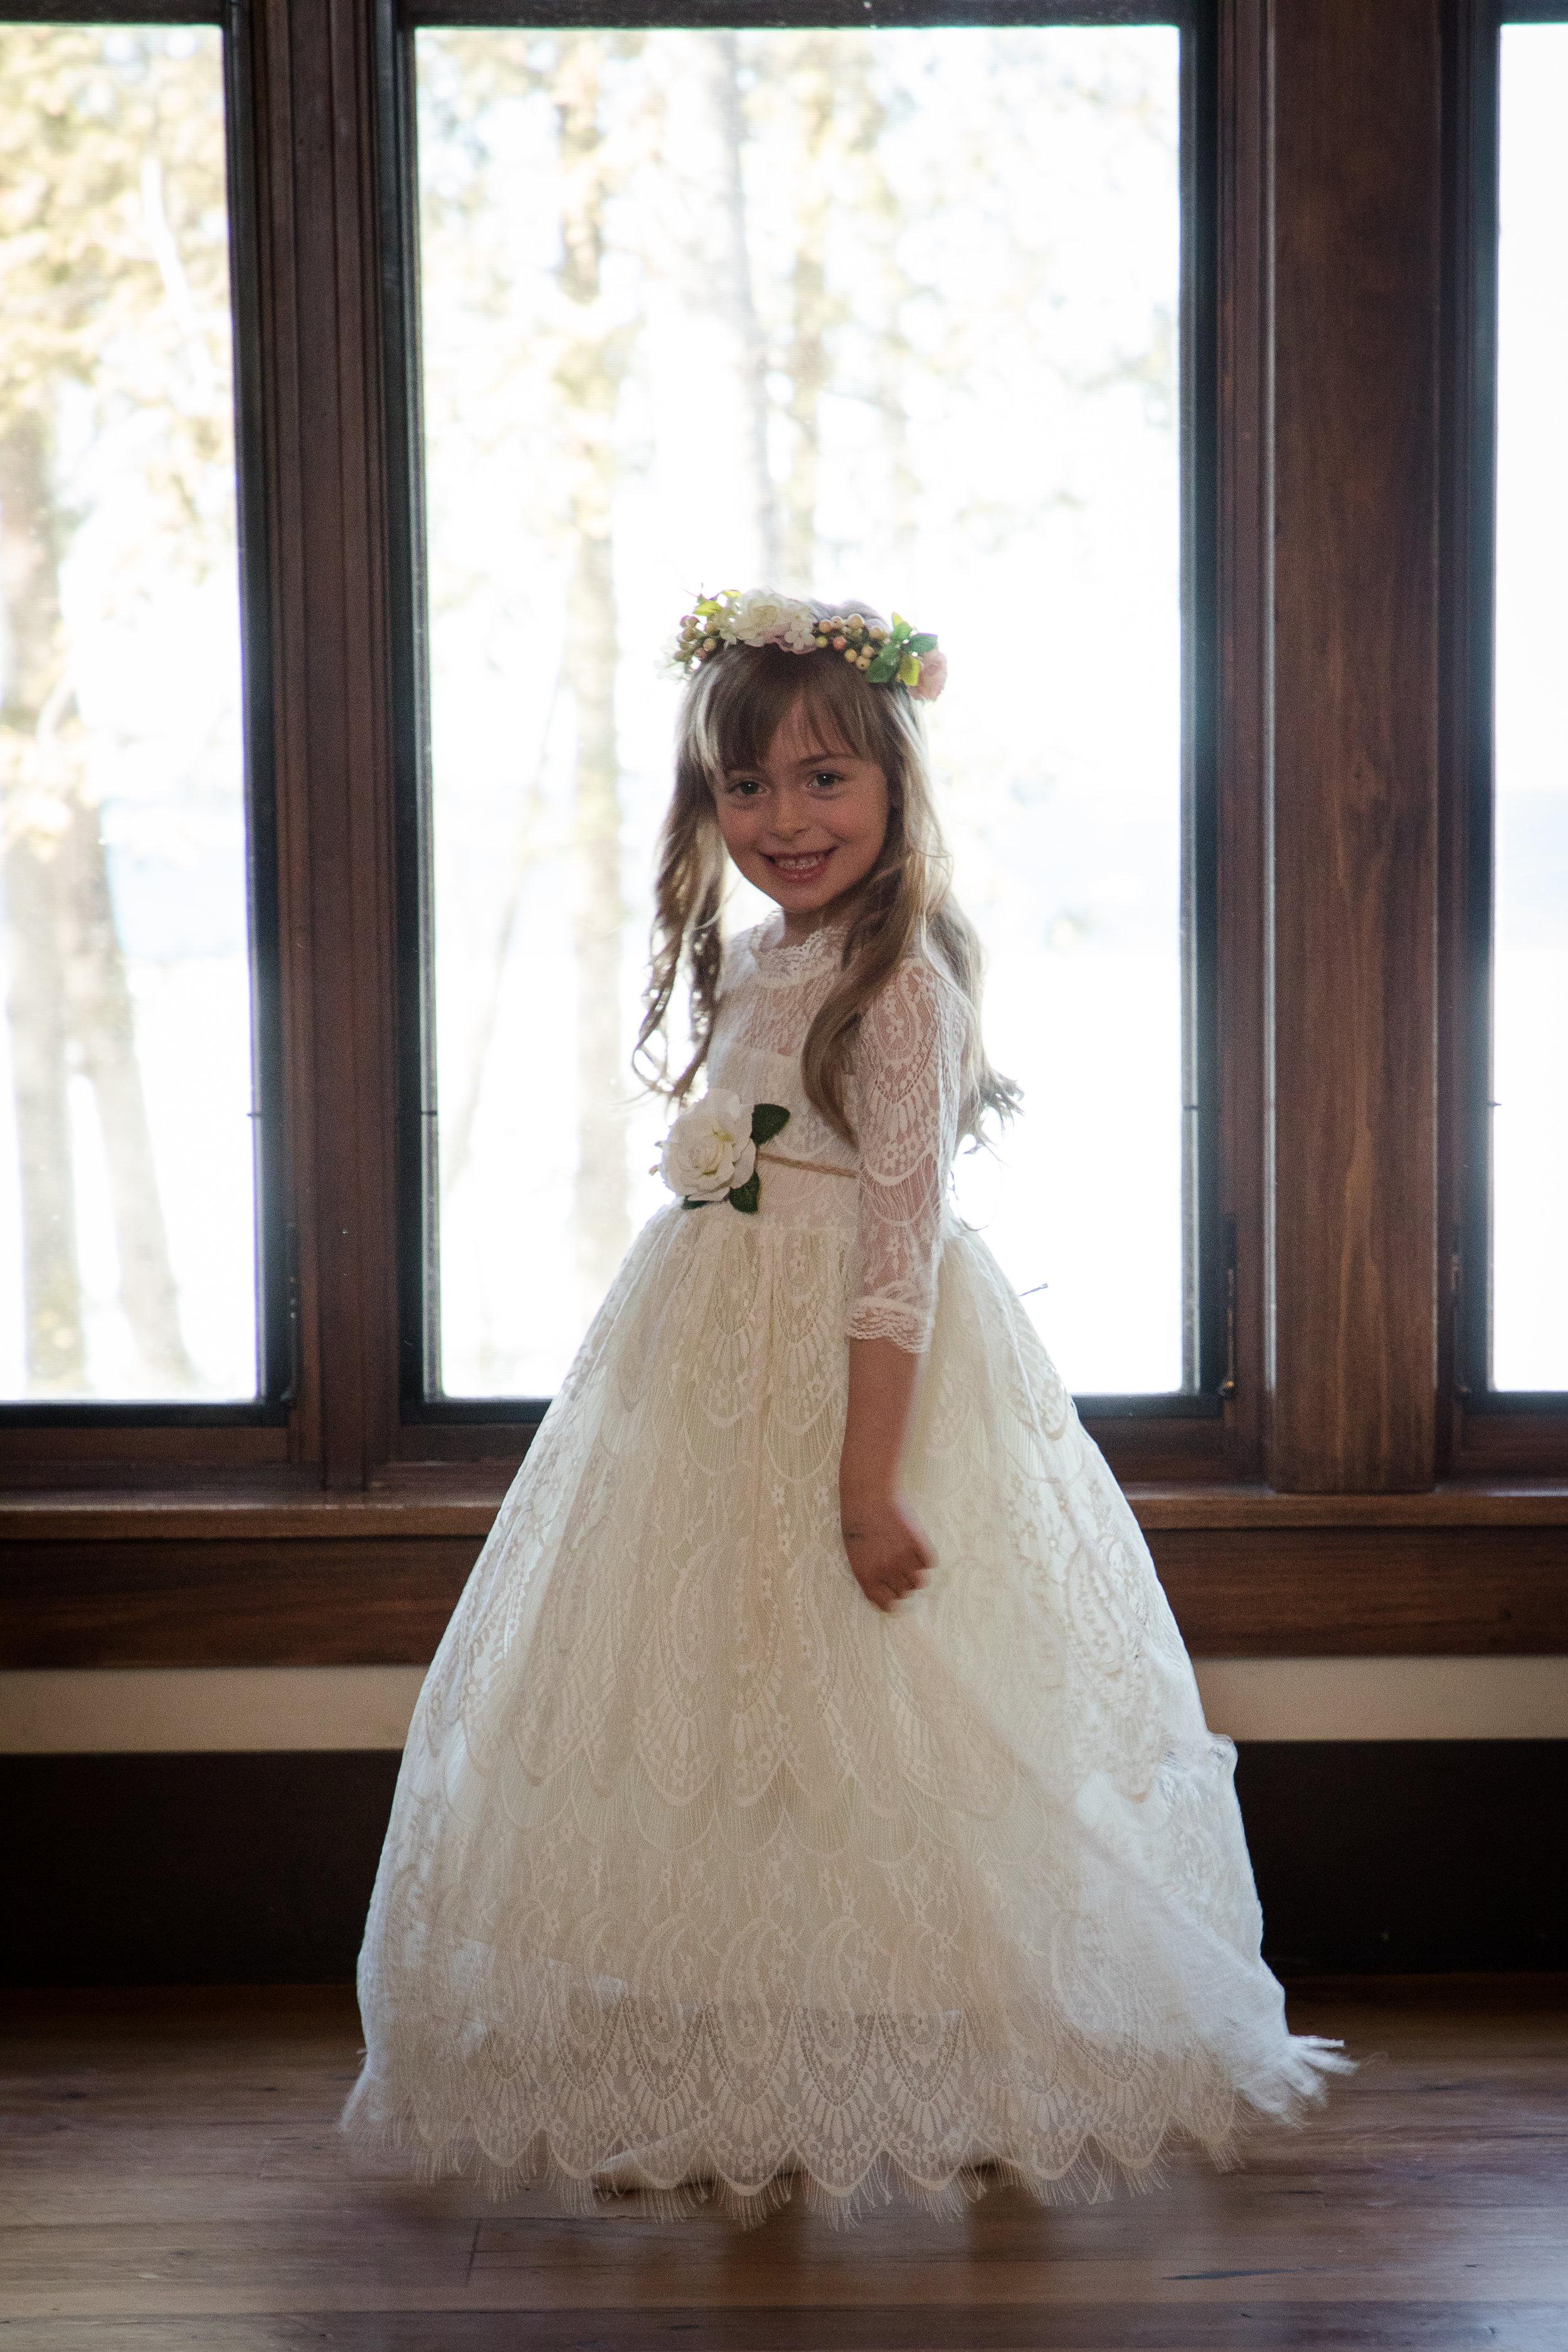 The-Griffiths-Wedding-10-03-10-28.jpg